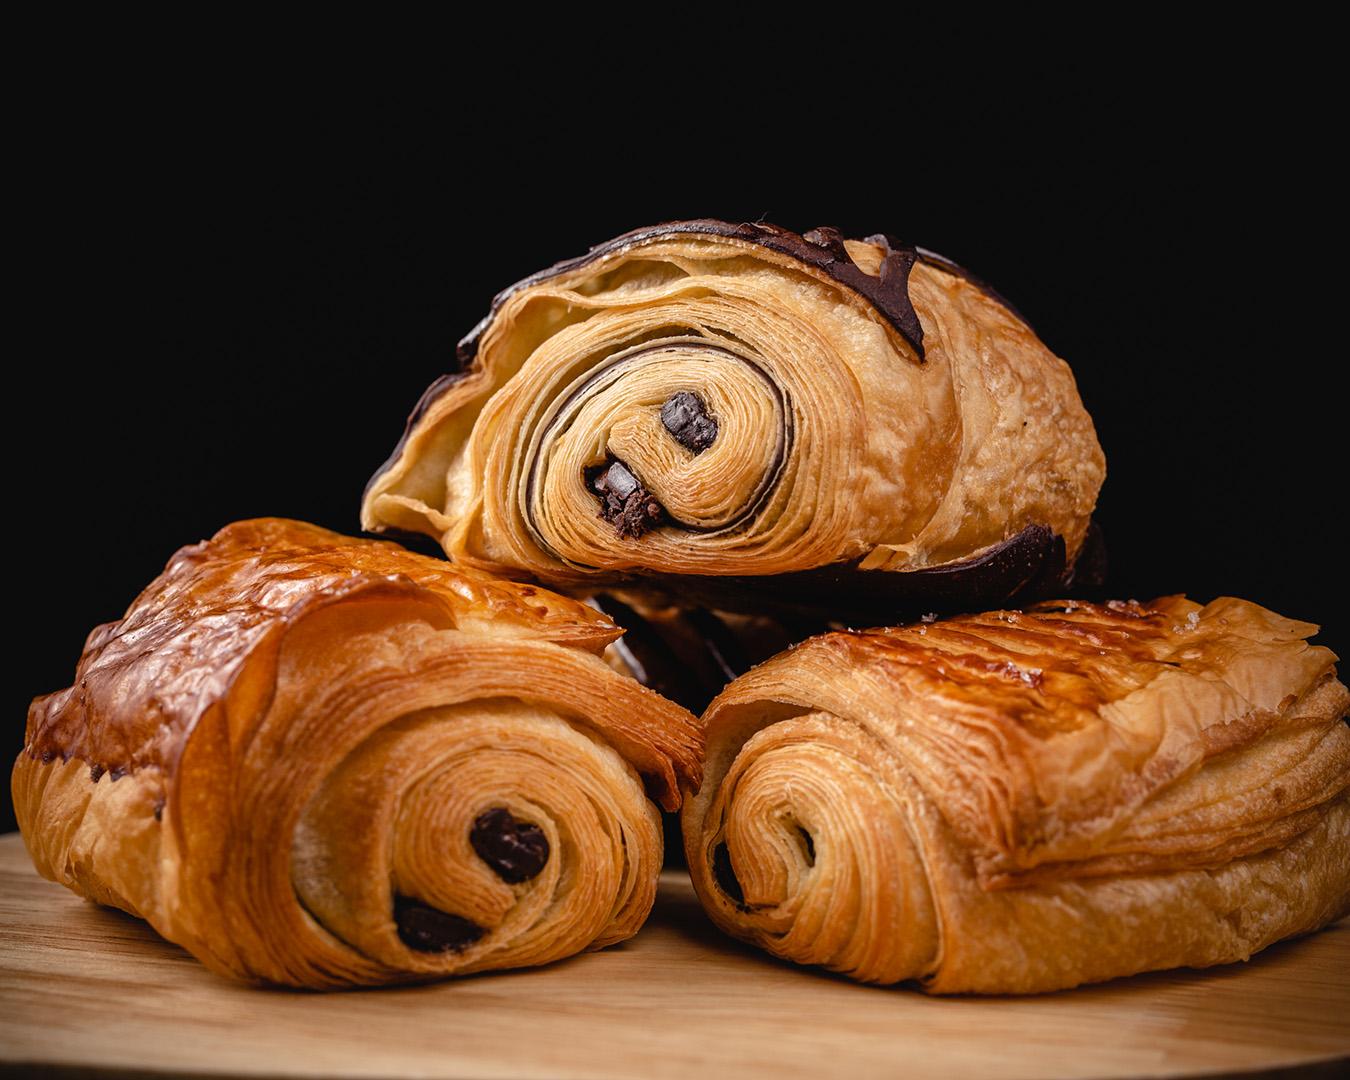 Saint Germain – Boulangerie – Patisserie